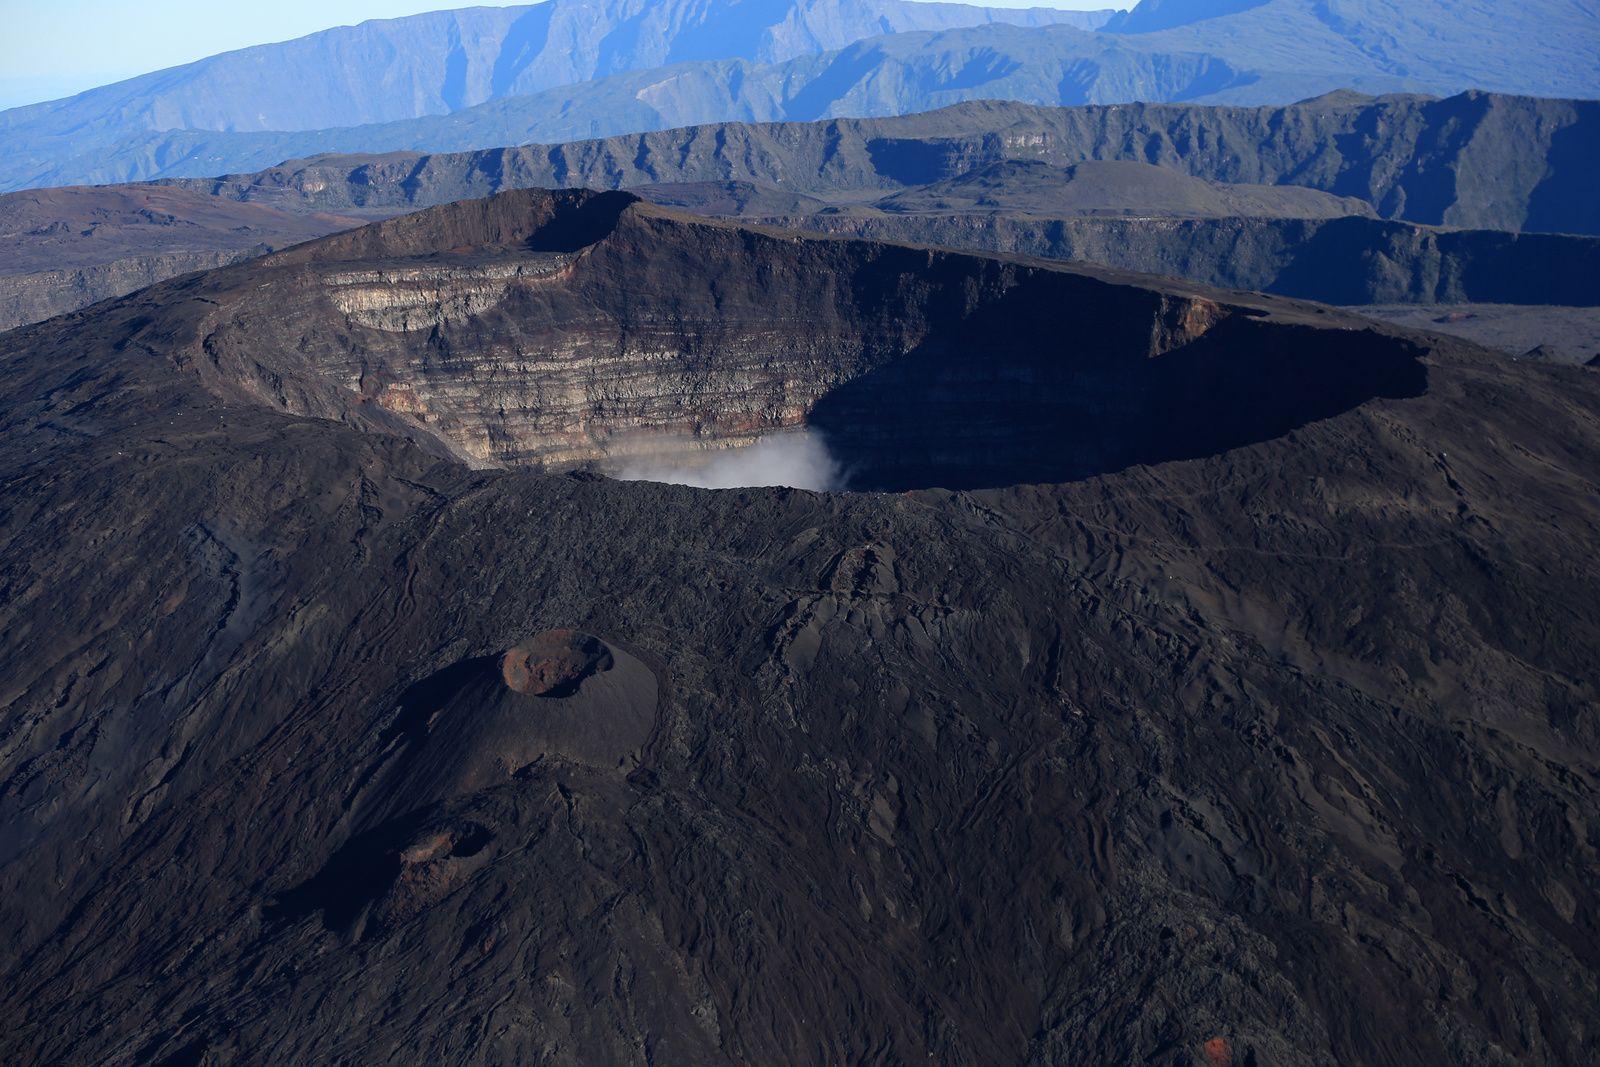 Piton De La Fournaise Dolomieu And Bory Craters Photo C Bernard Duyck 2017 Volcano Natural Landmarks Earth